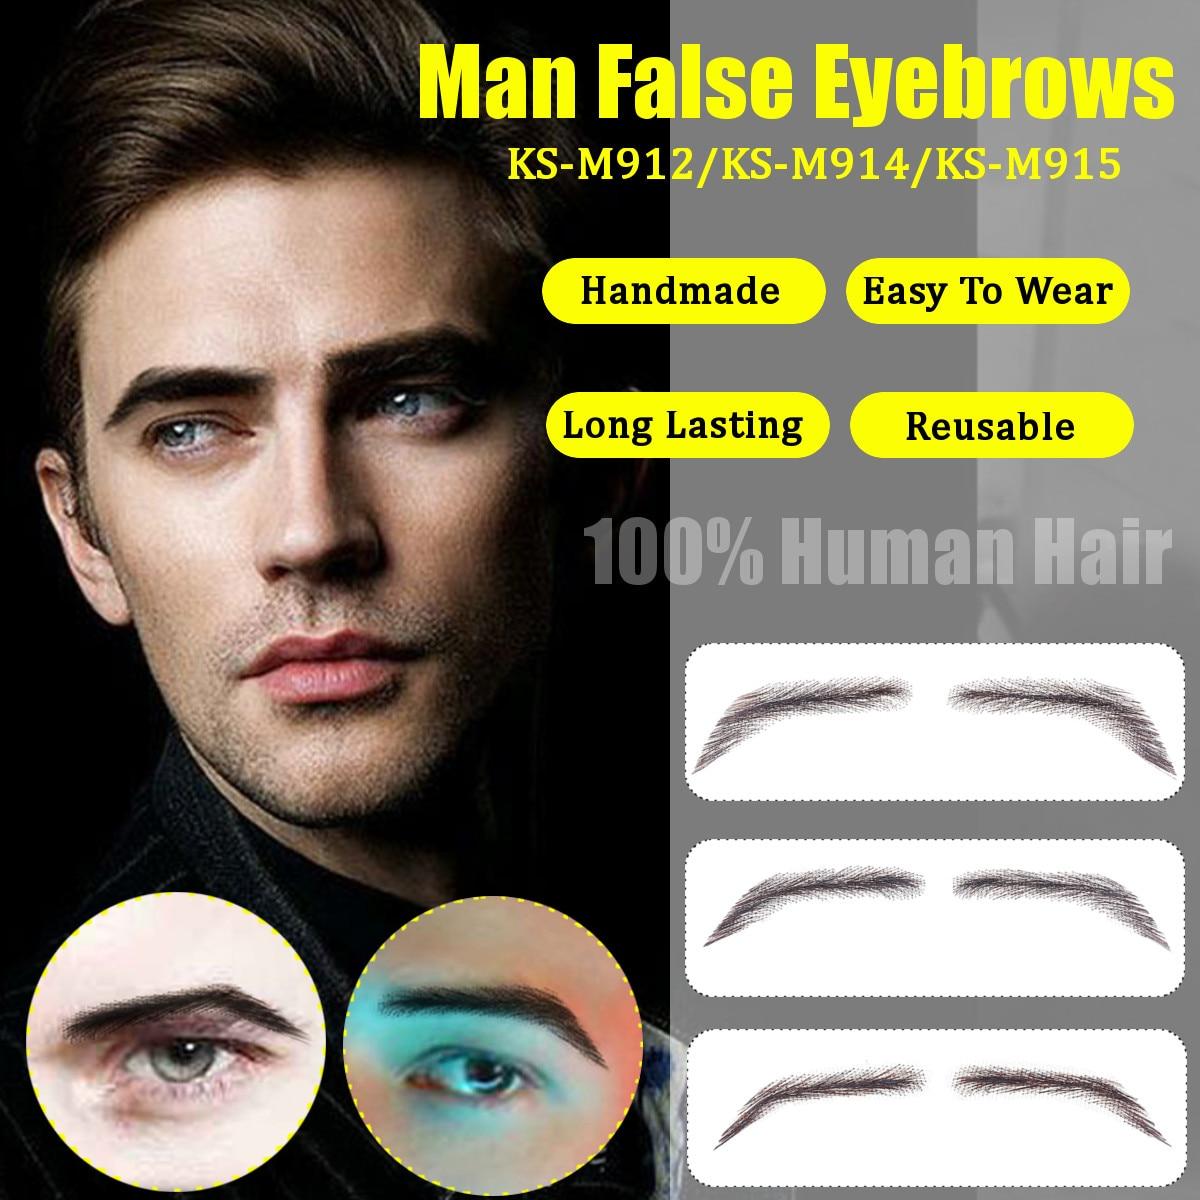 Handmade Human Hair False Eyebrows Lace Base For Man For Party Wedding Cosplay Star Fake Eyebrow Synthetic Eyebrows